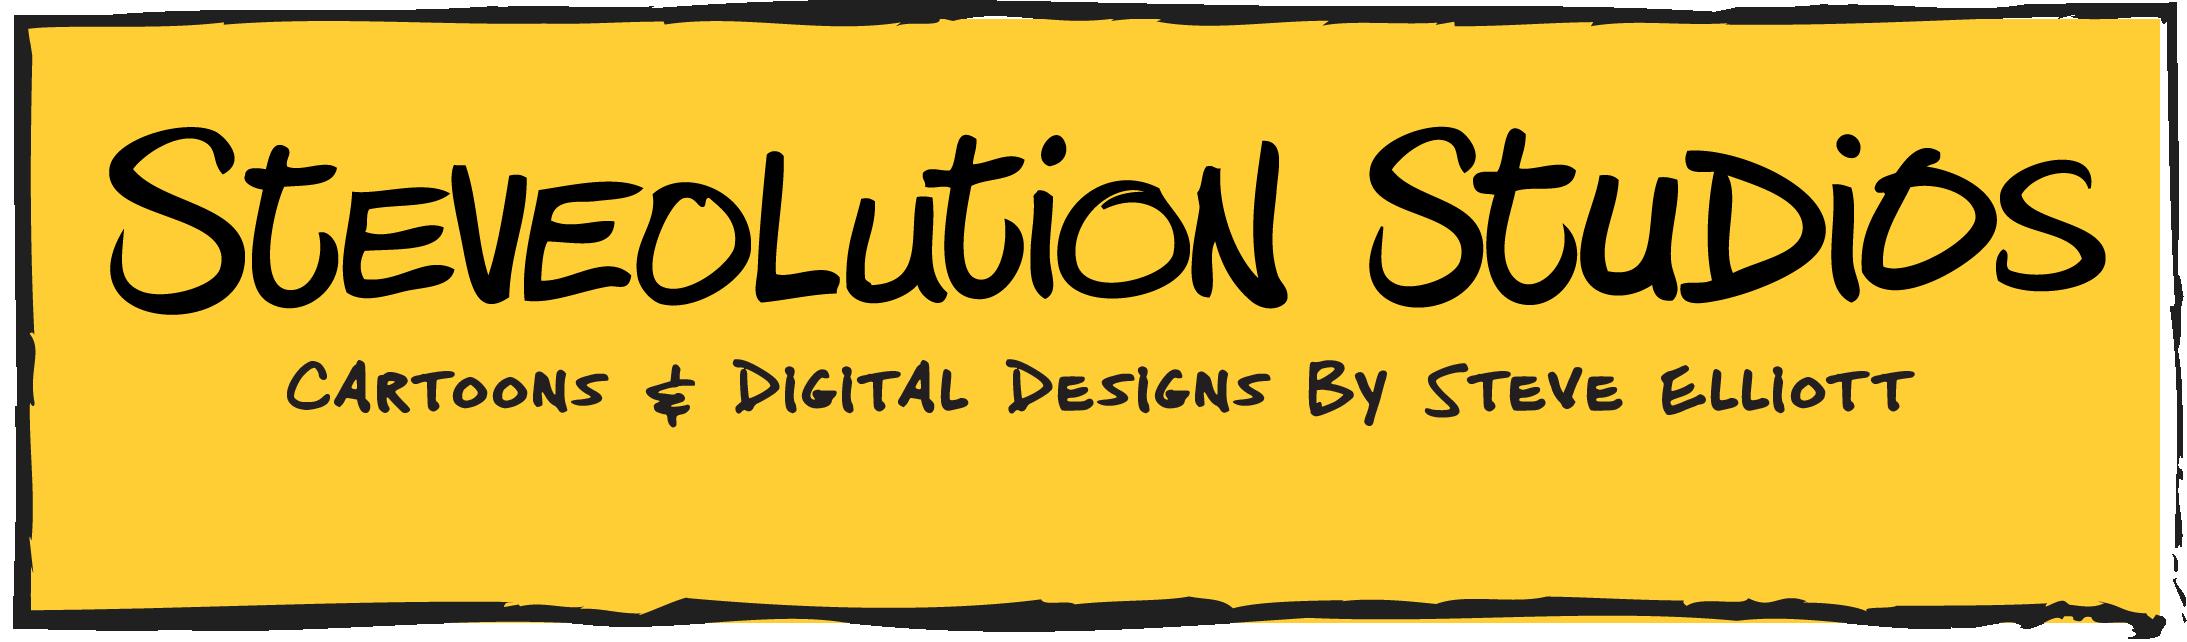 SteveoLution Studios Welcomes You!